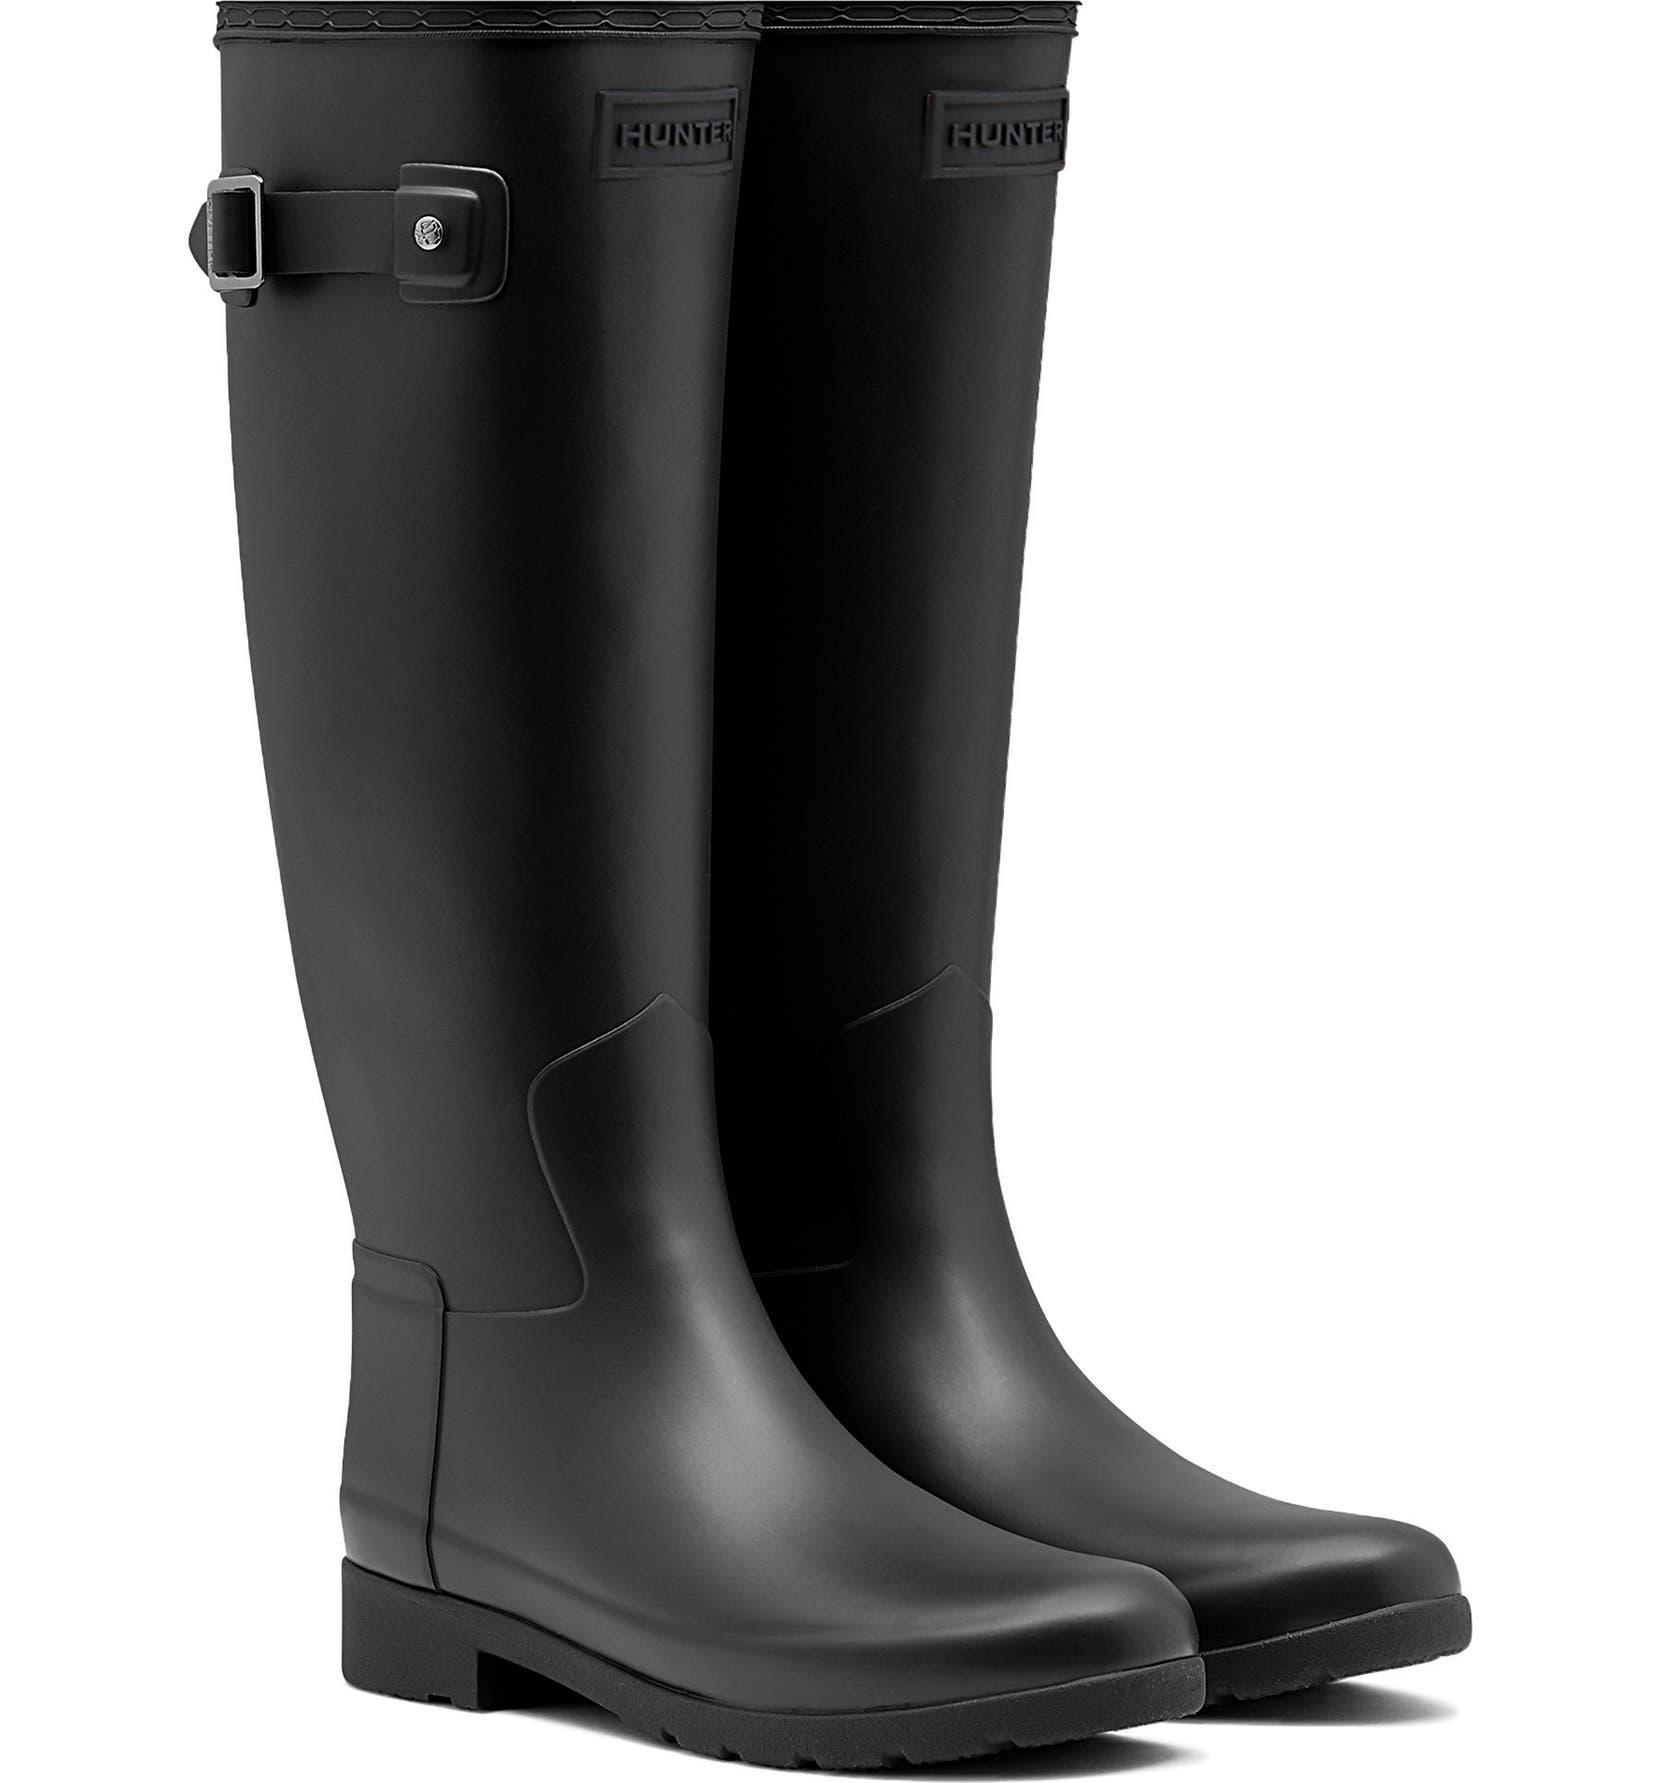 6703c4690d35 Hunter Original Refined Waterproof Rain Boot (Women) (Regular & Narrow  Calf) | Nordstrom